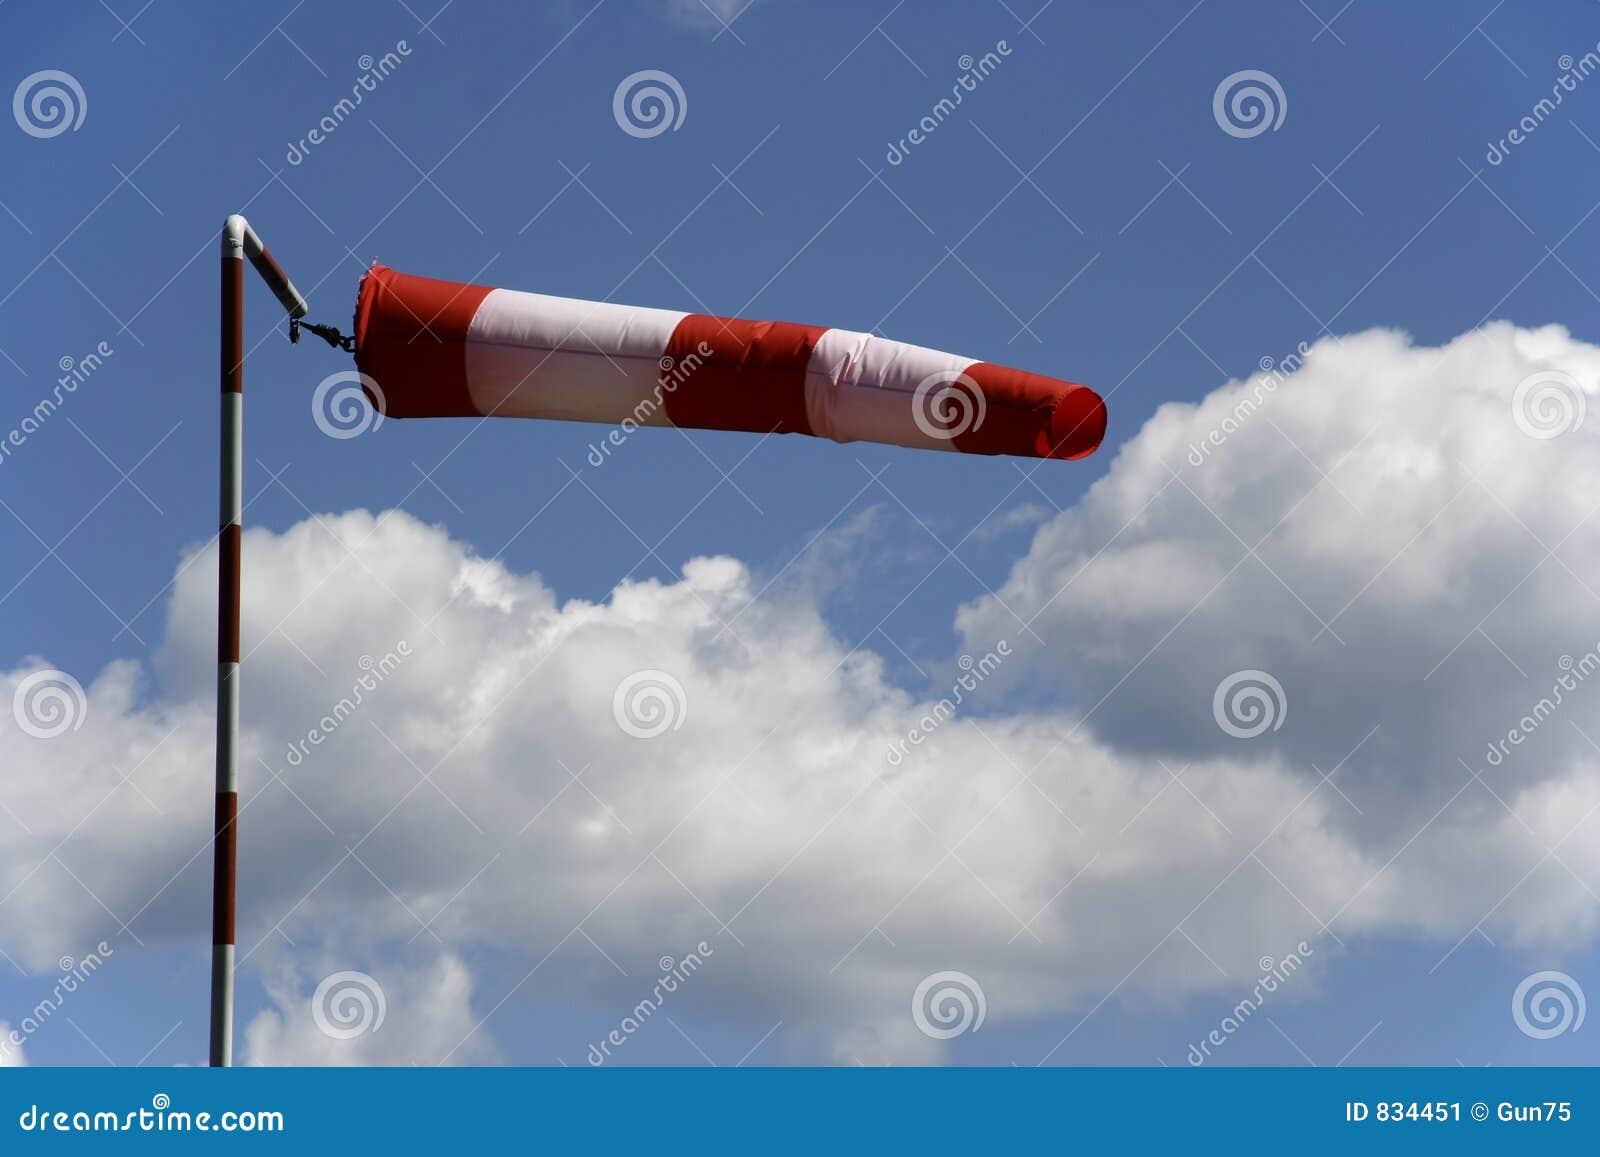 Wind sock and sky